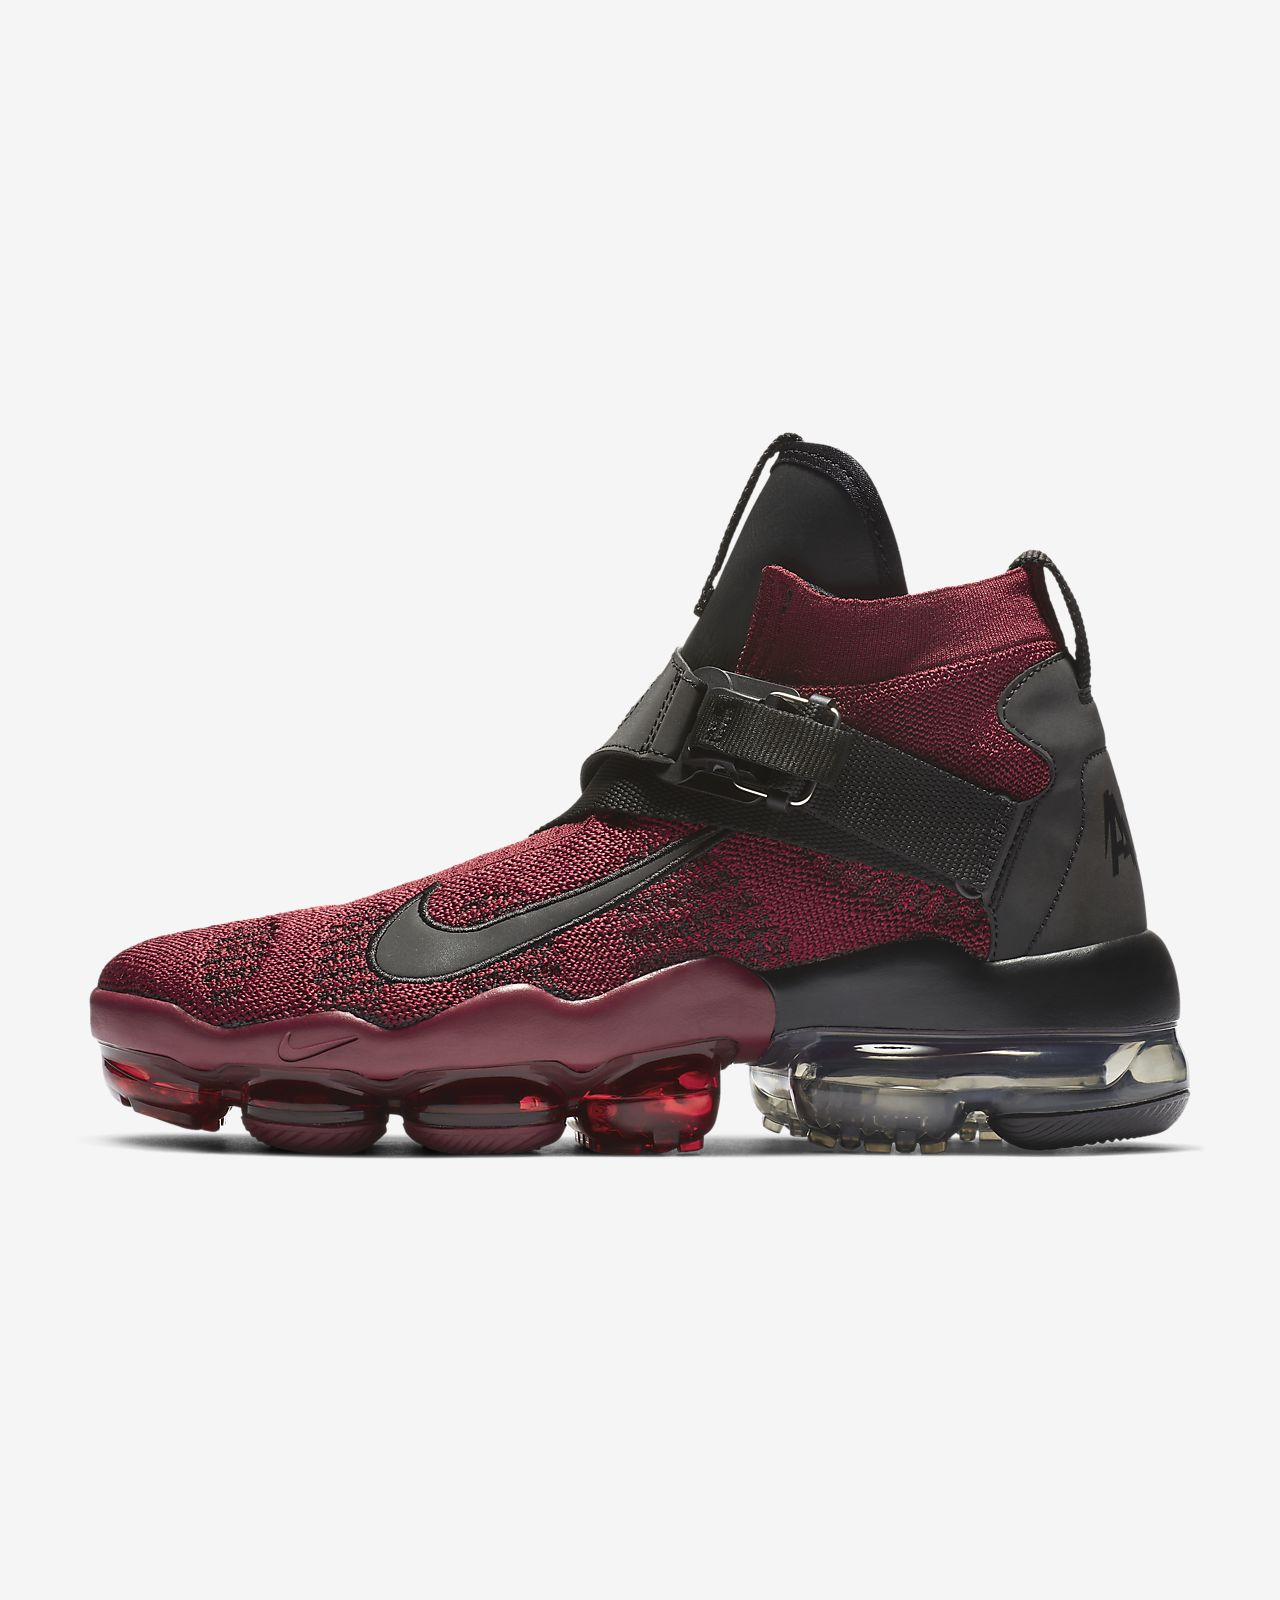 62b67f0149f3 Nike Air VaporMax Premier Flyknit Men s Shoe. Nike.com